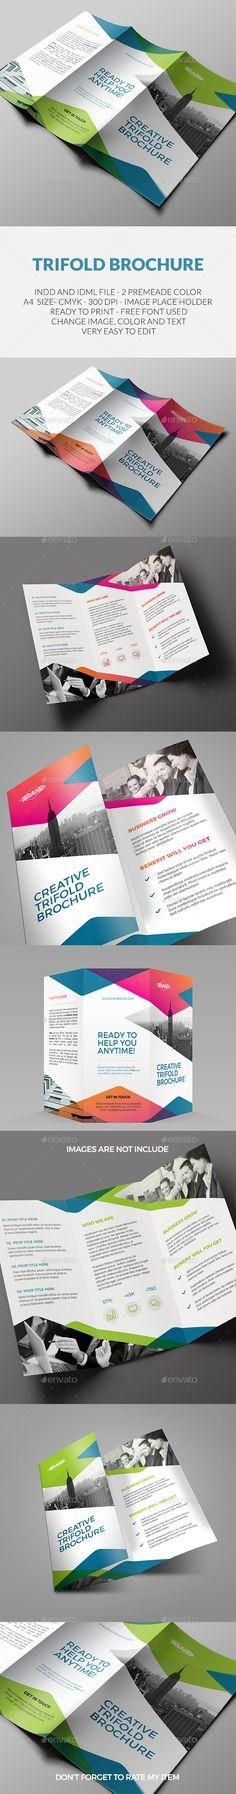 Trifold Brochure Template #design Download: http://graphicriver.net/item/trifold-brochure/11886772?ref=ksioks